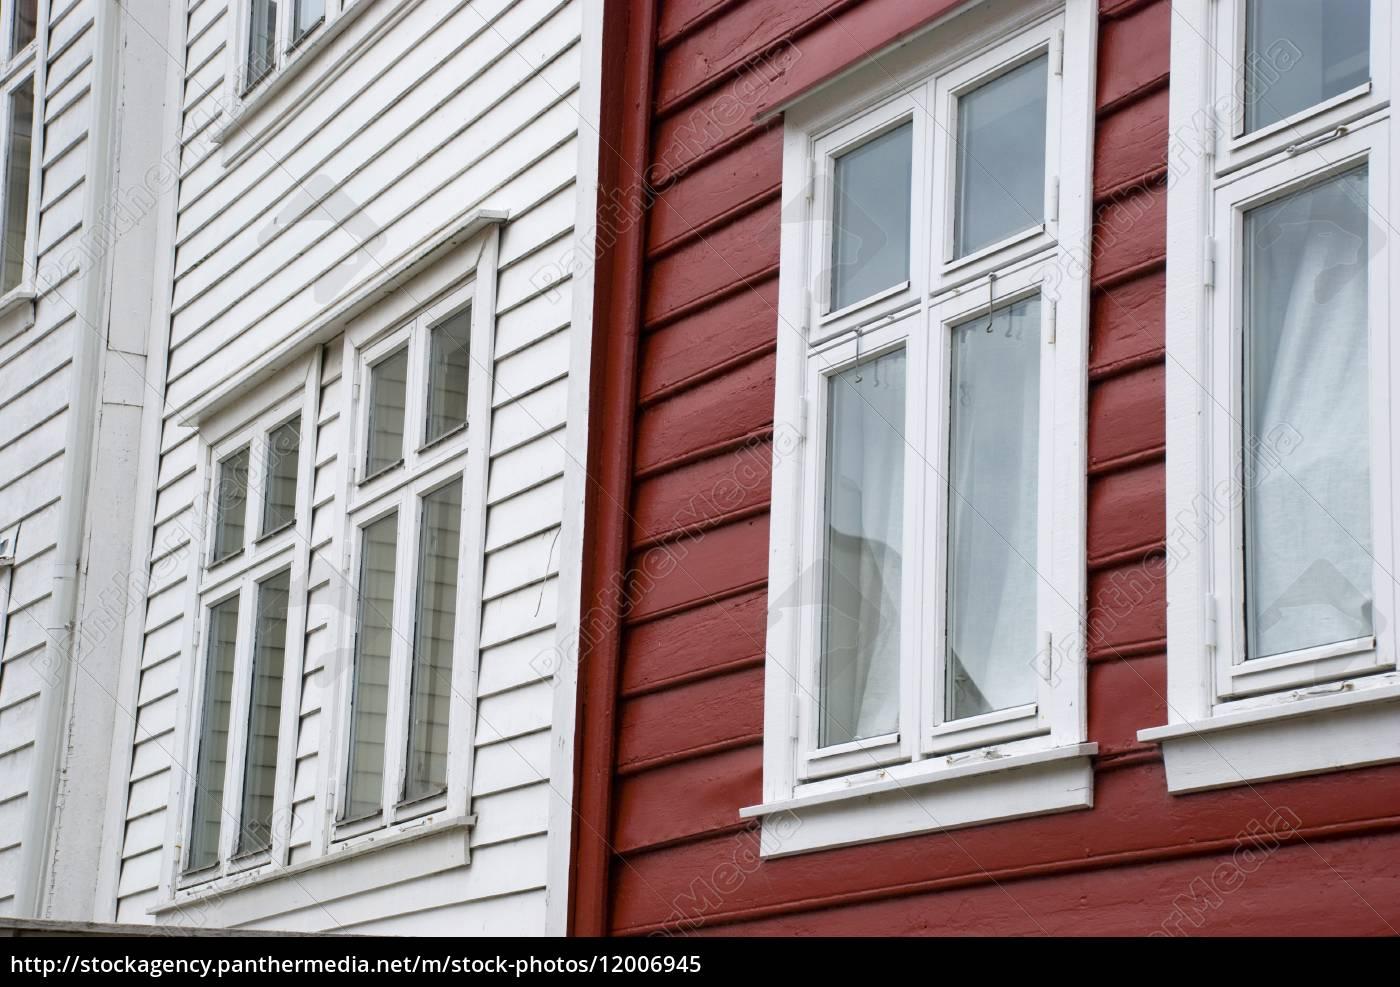 Skandinavische Holzhäuser typisch skandinavische holzhäuser in norwegen in rot stockfoto